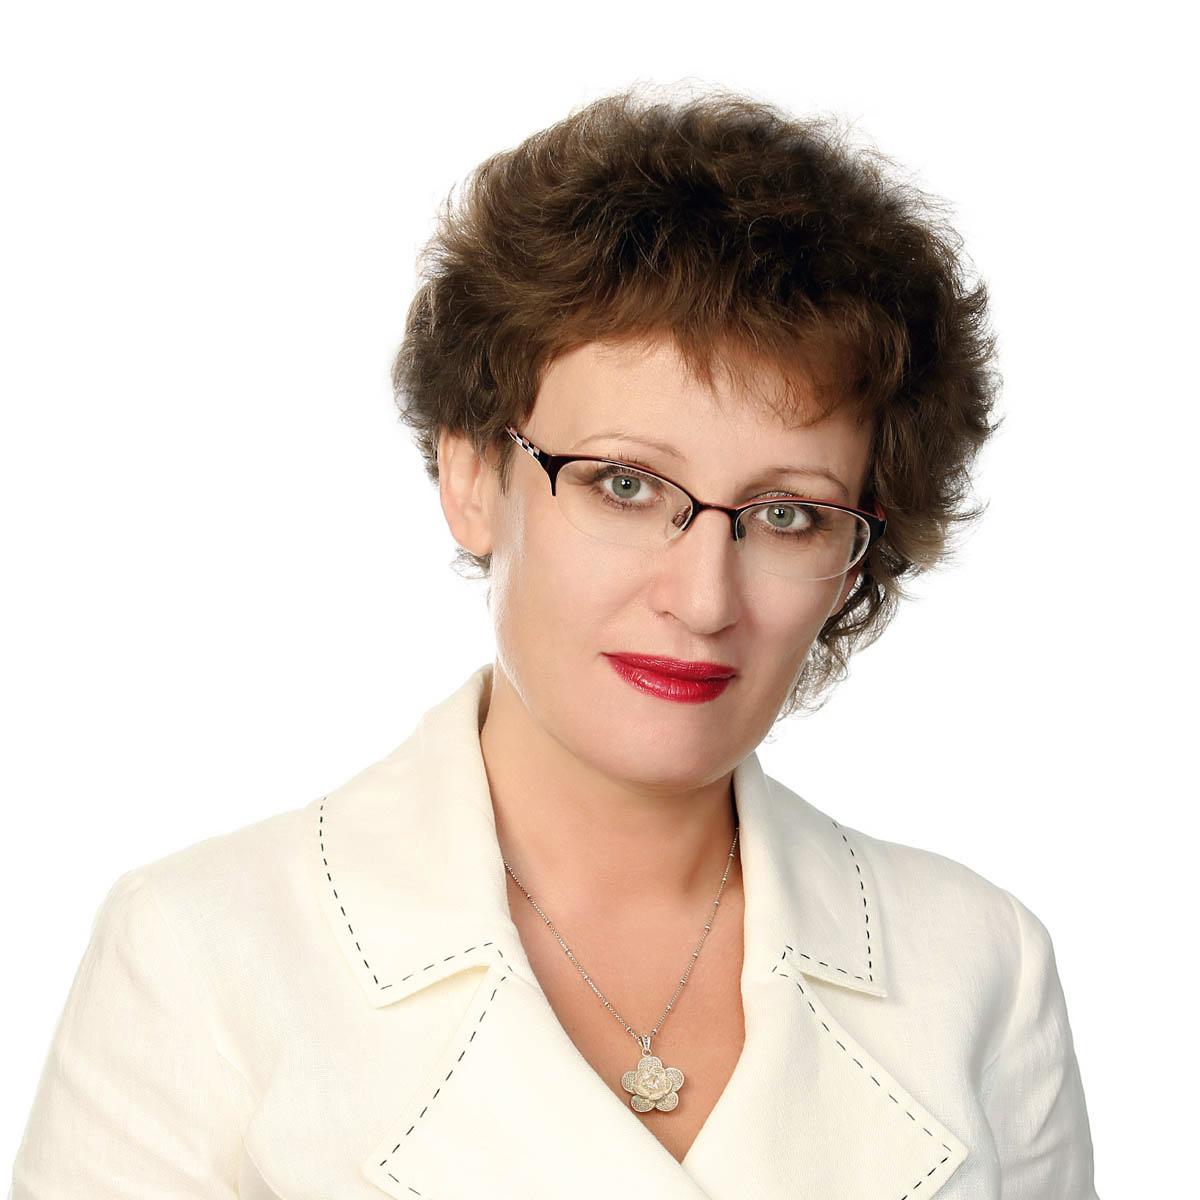 Бахарева Юлия Юрьевна